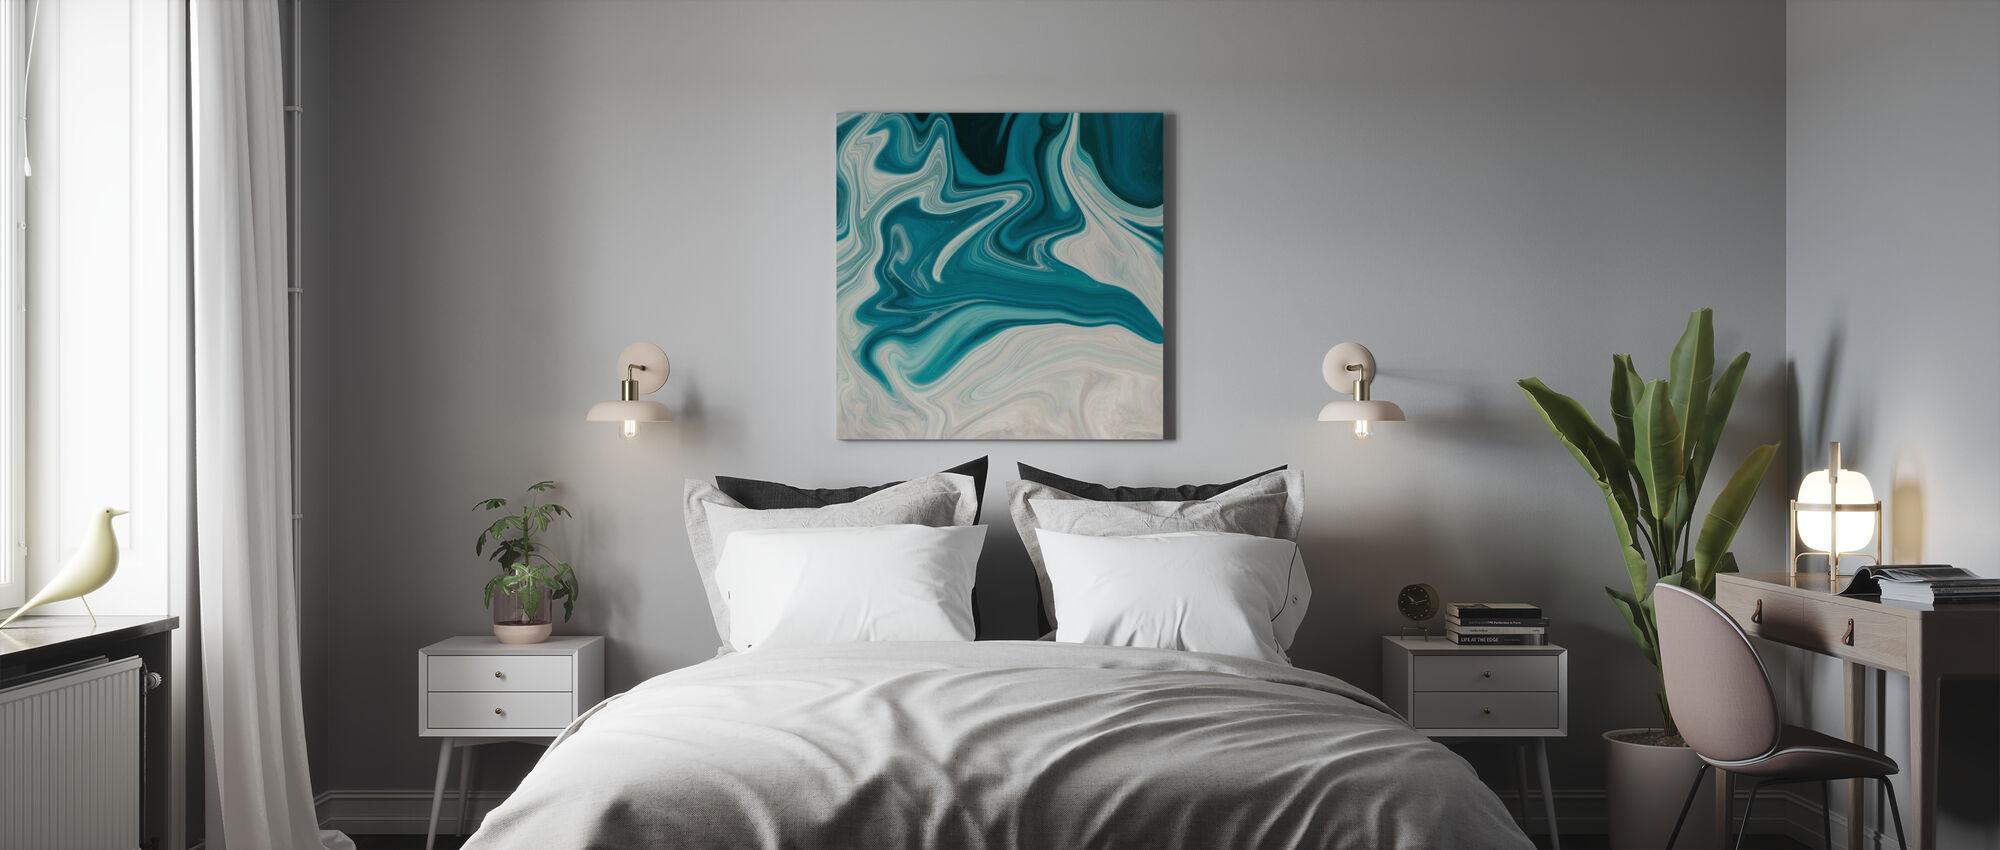 Marmorimeri - Canvastaulu - Makuuhuone